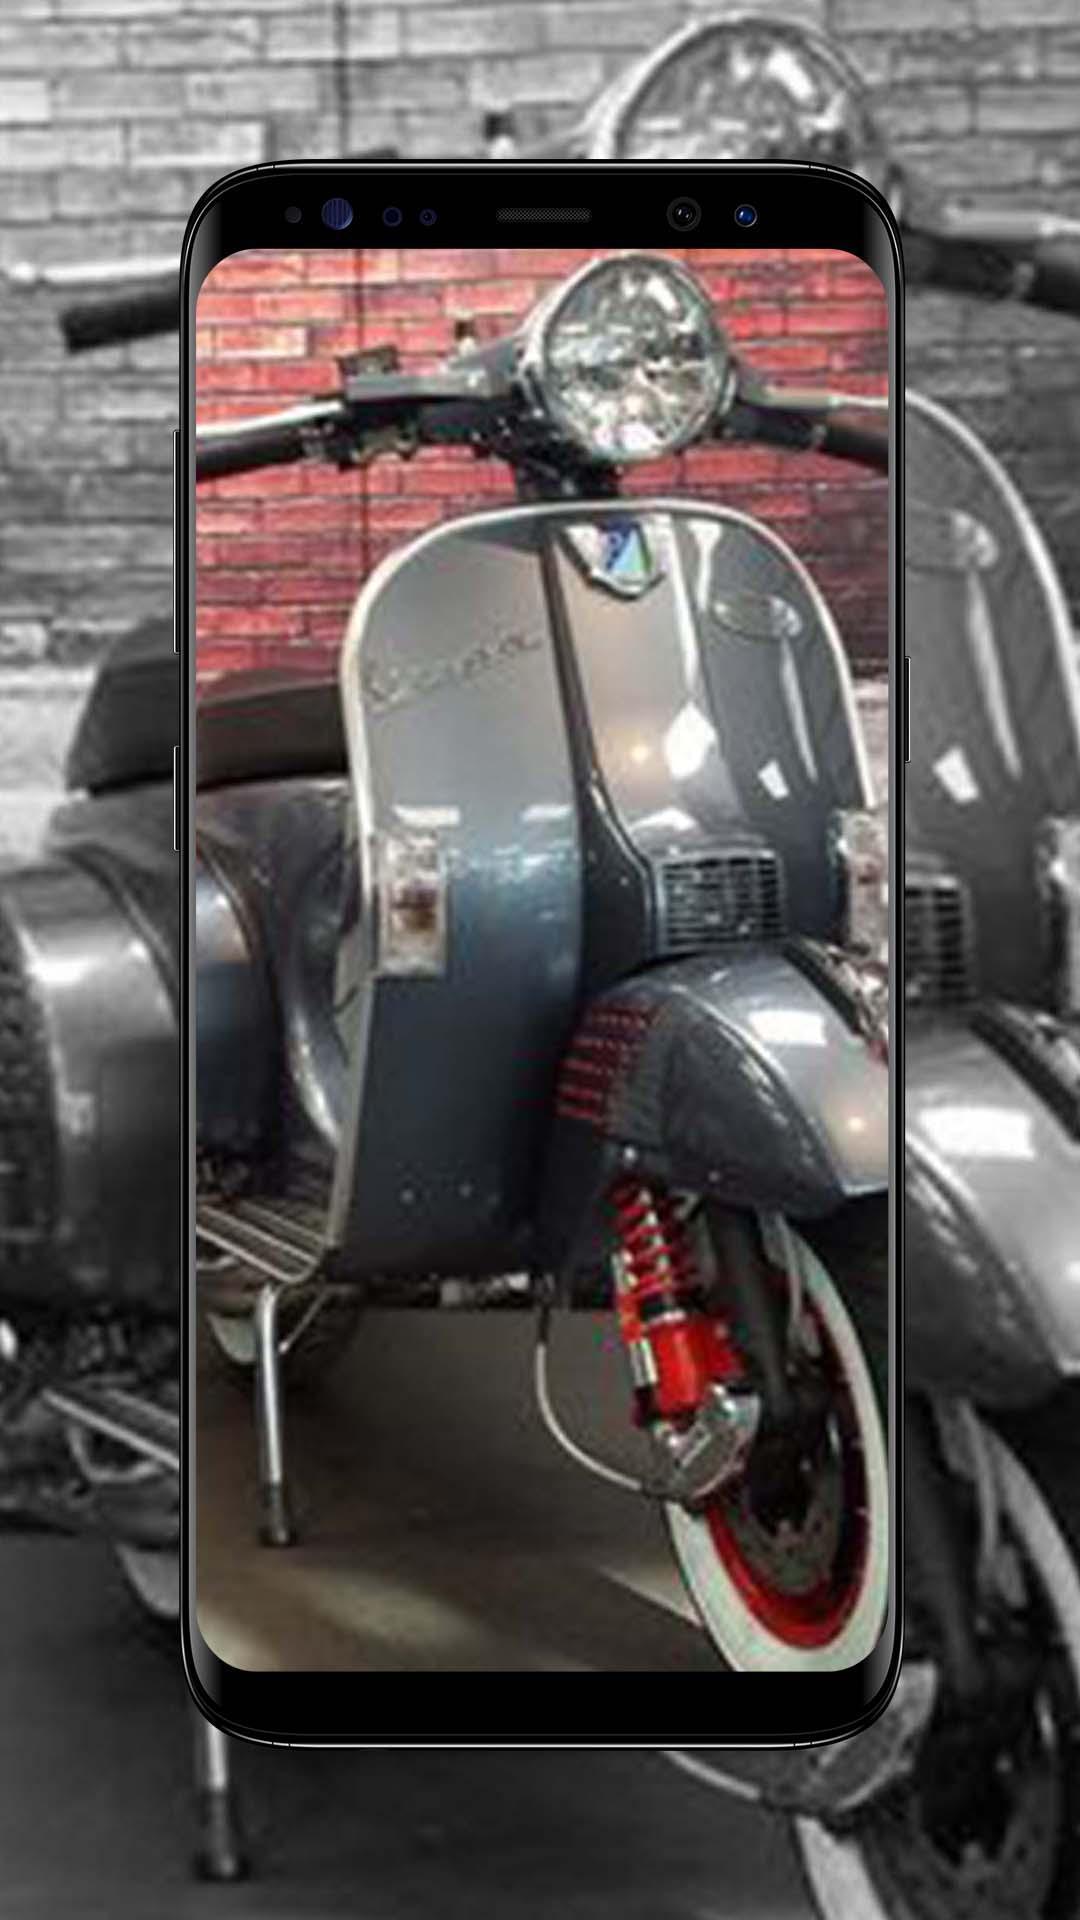 Unduh 570 Koleksi Background Pemandangan Motor HD Gratis